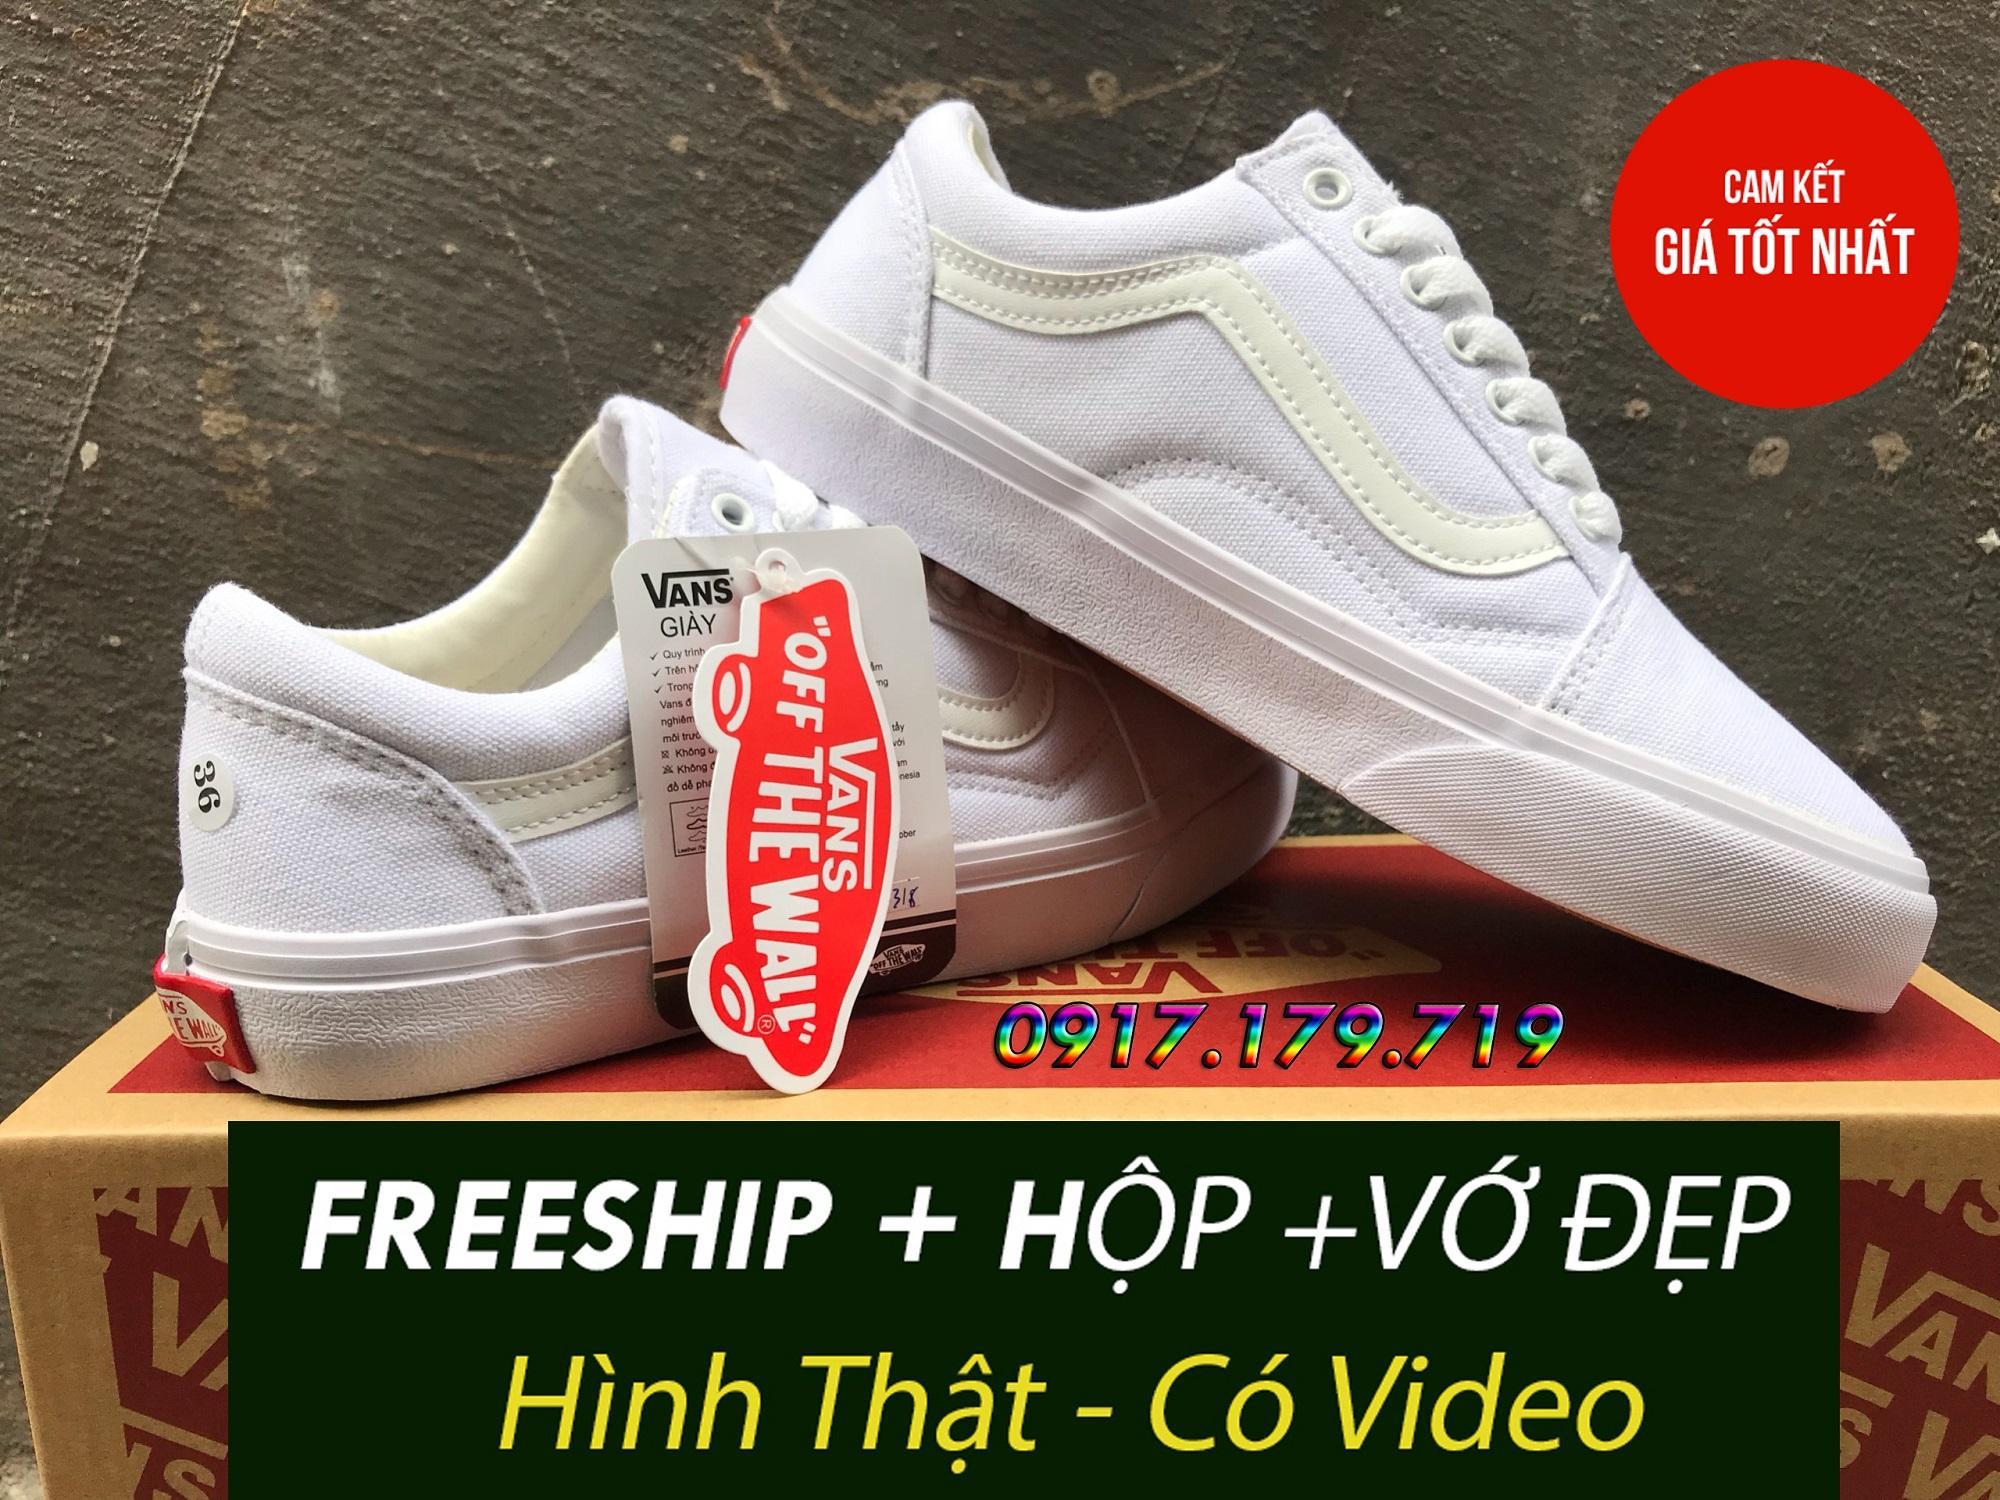 Hình ảnh [FULLBOX+FREESHIP+VỚ] Van Old Skool Full White